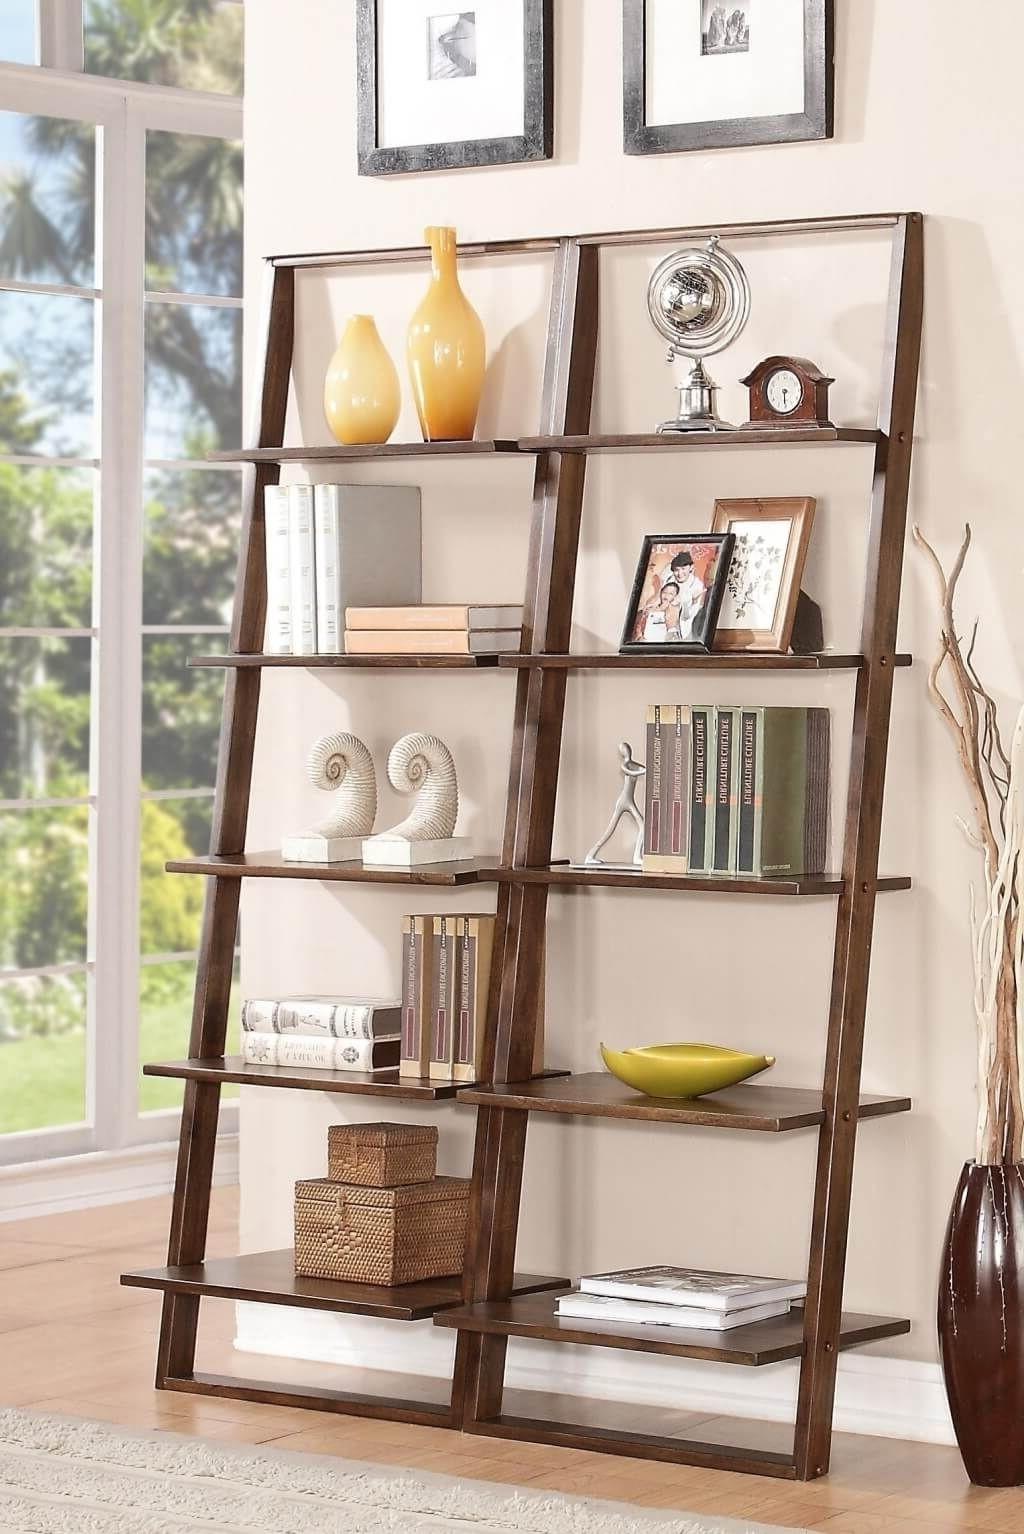 Current Menards Bookcases In Furniture: Enticing Leaning Bookcase Ideas – Leaning Bookcase With (View 6 of 15)